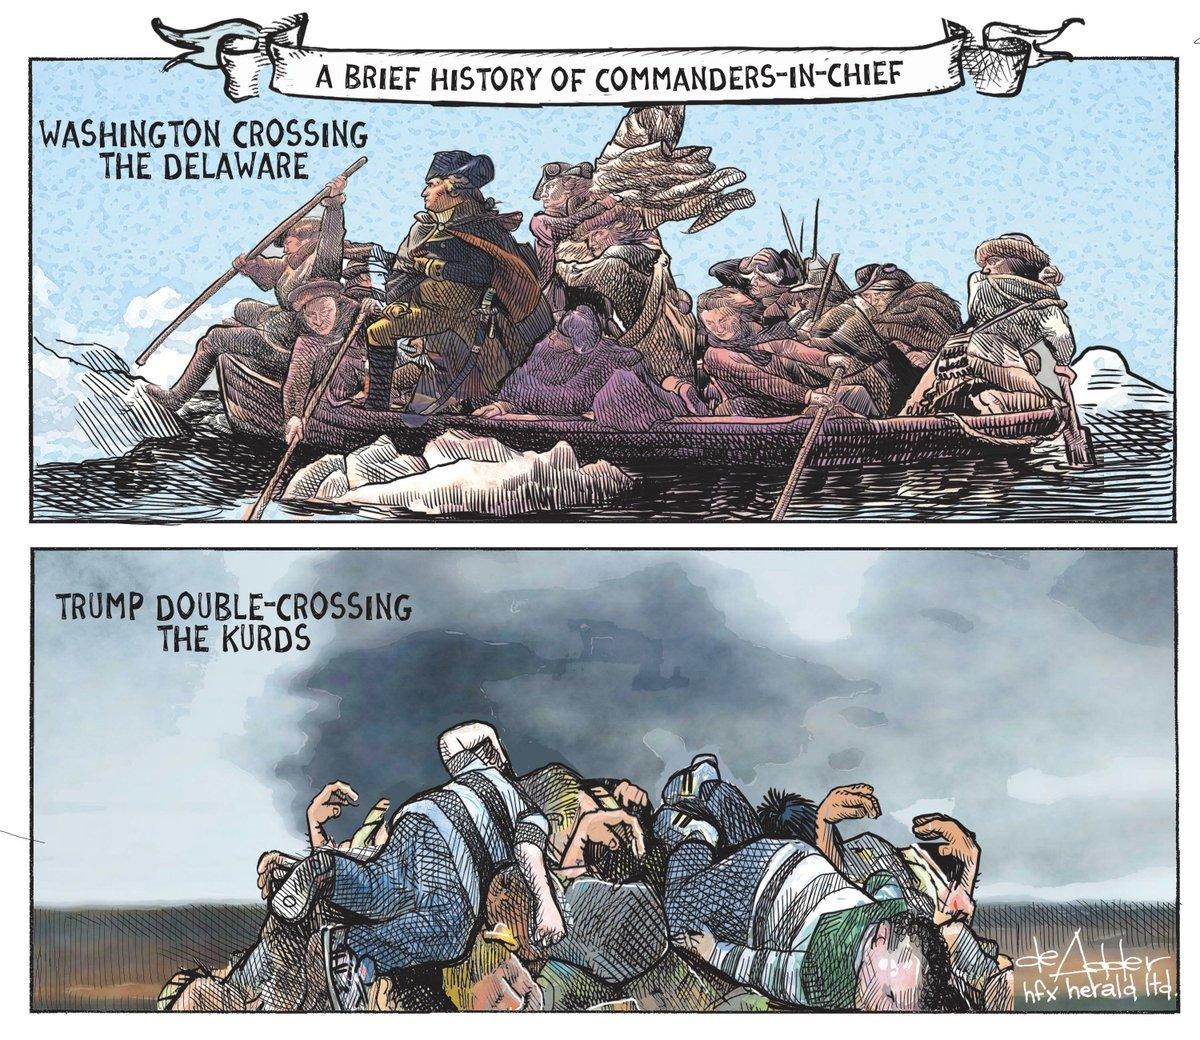 Cartoon for @chronicleherald #Trump #Kurds #KurdsBetrayedByTrump #KurdsBetrayed #uspoli<br>http://pic.twitter.com/x1Yxvh7G1u